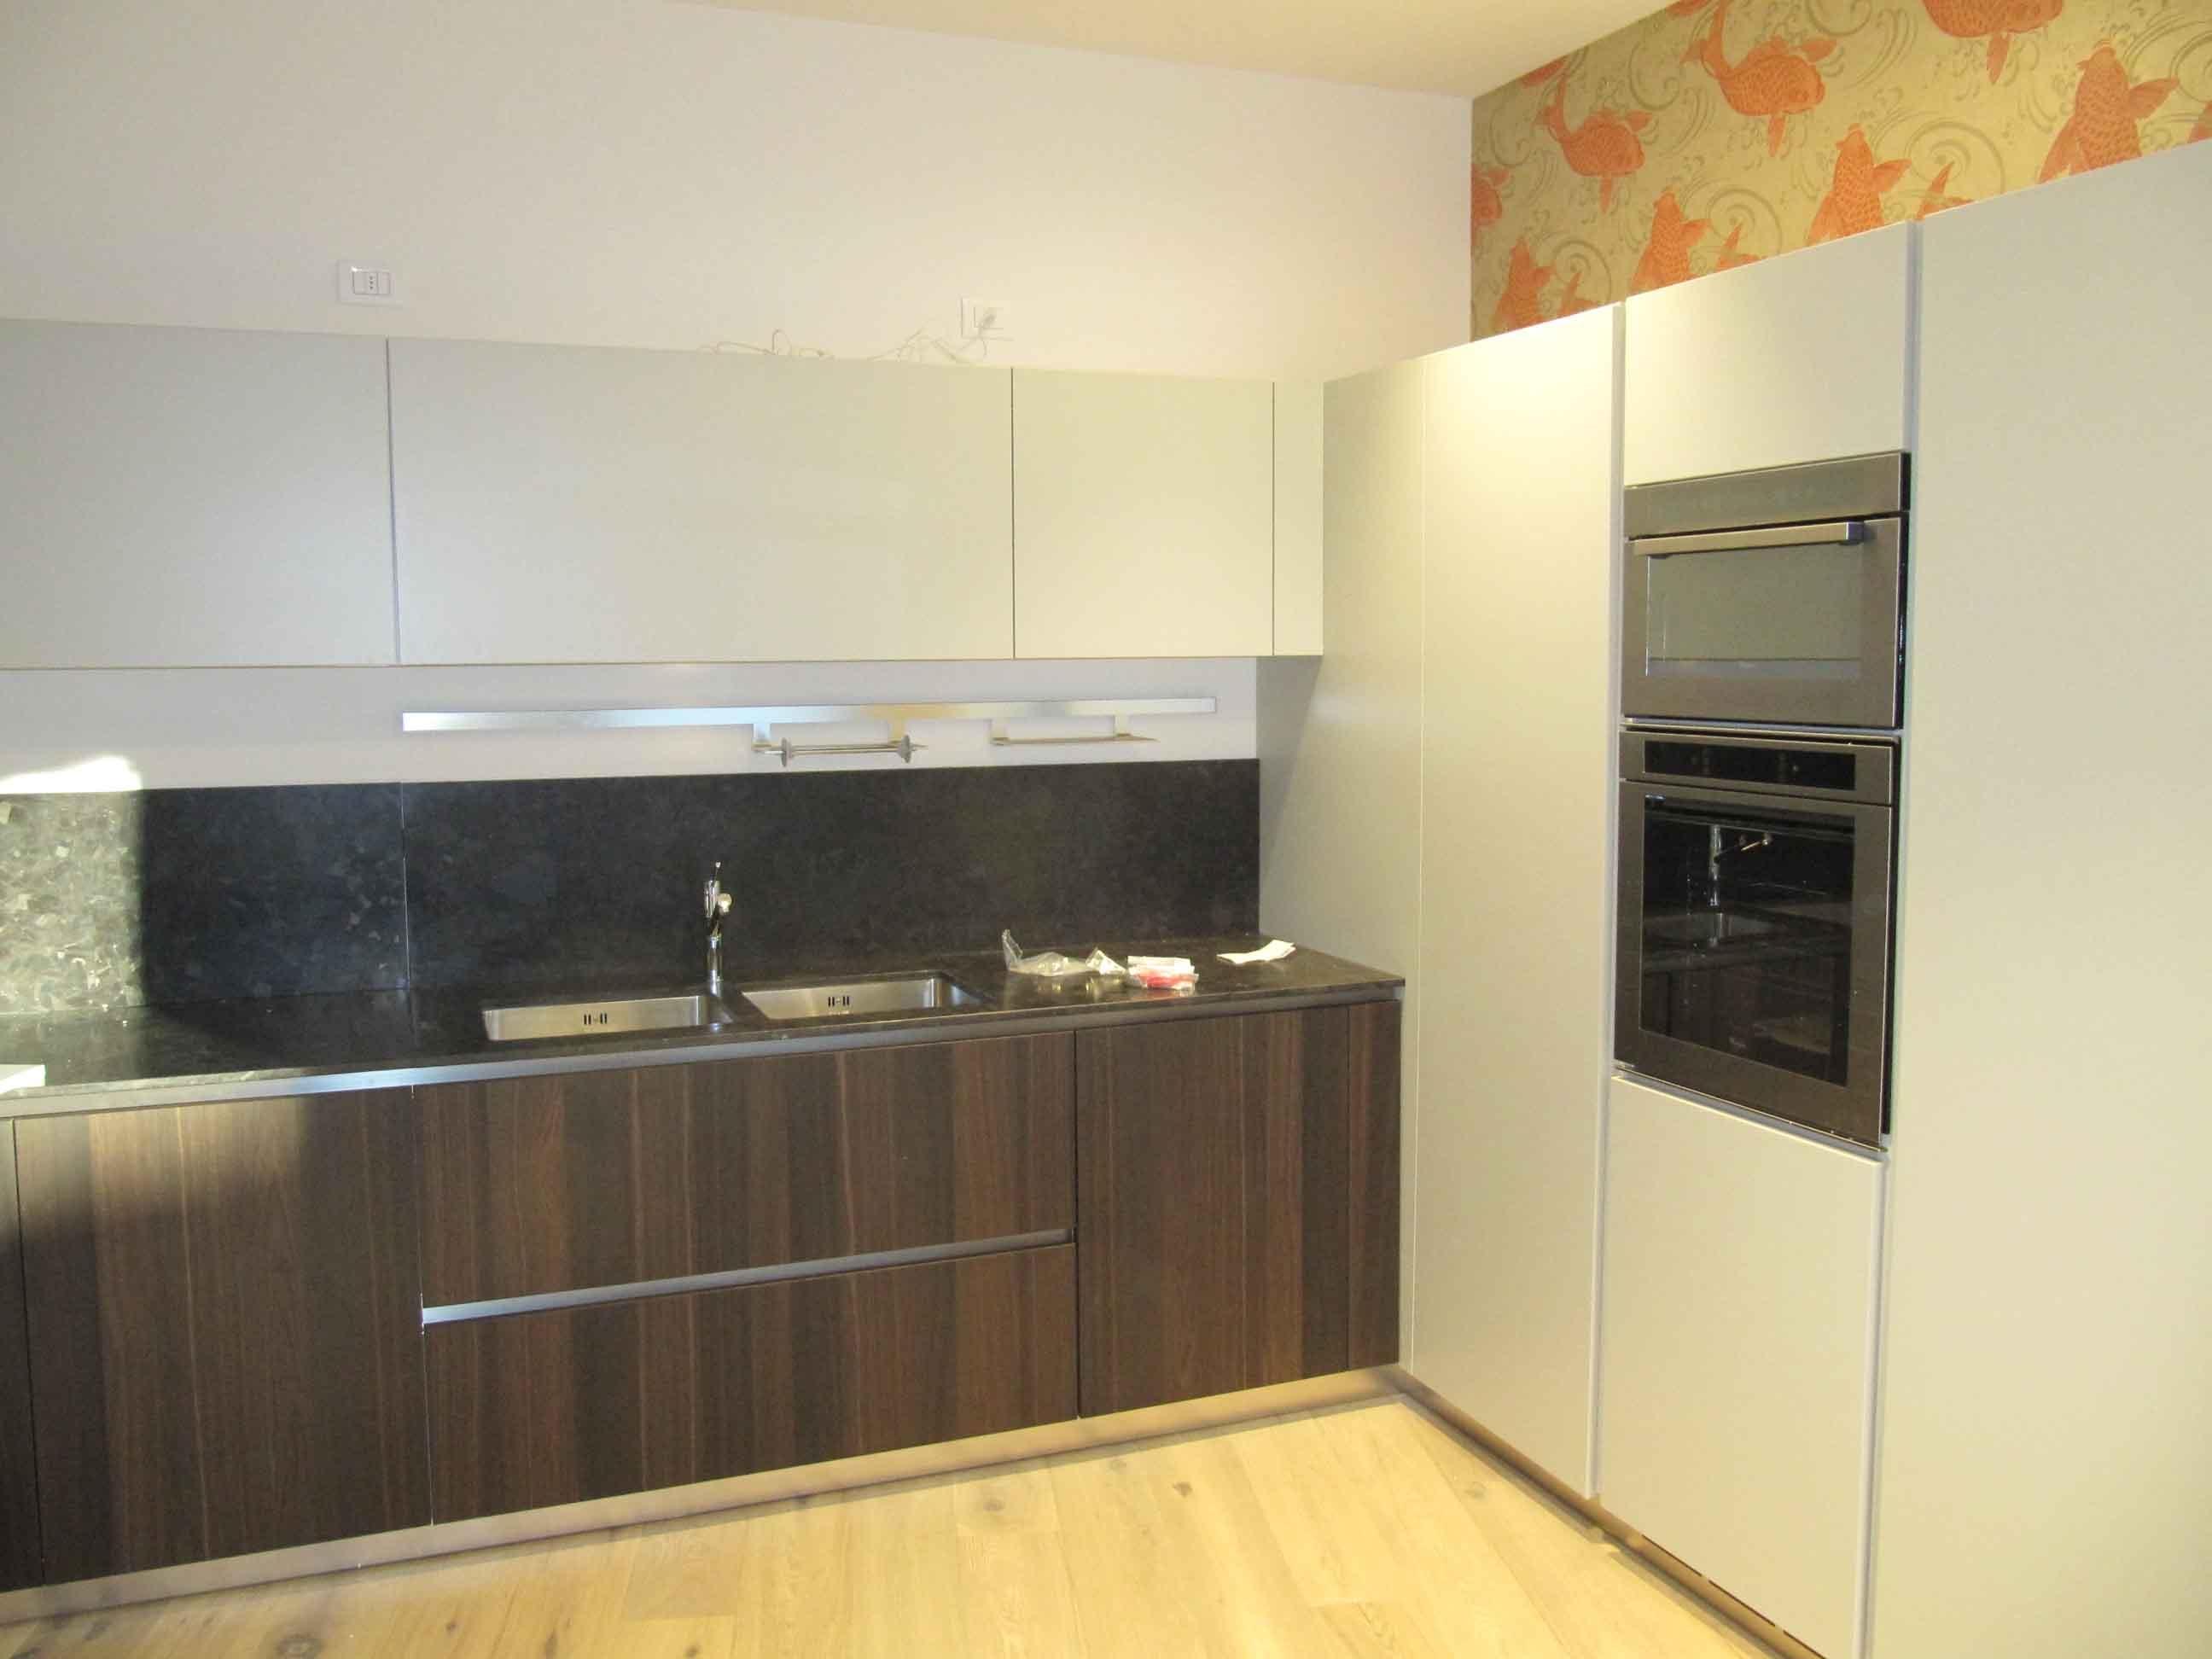 Cucina design legno Rovere - Cucine a prezzi scontati